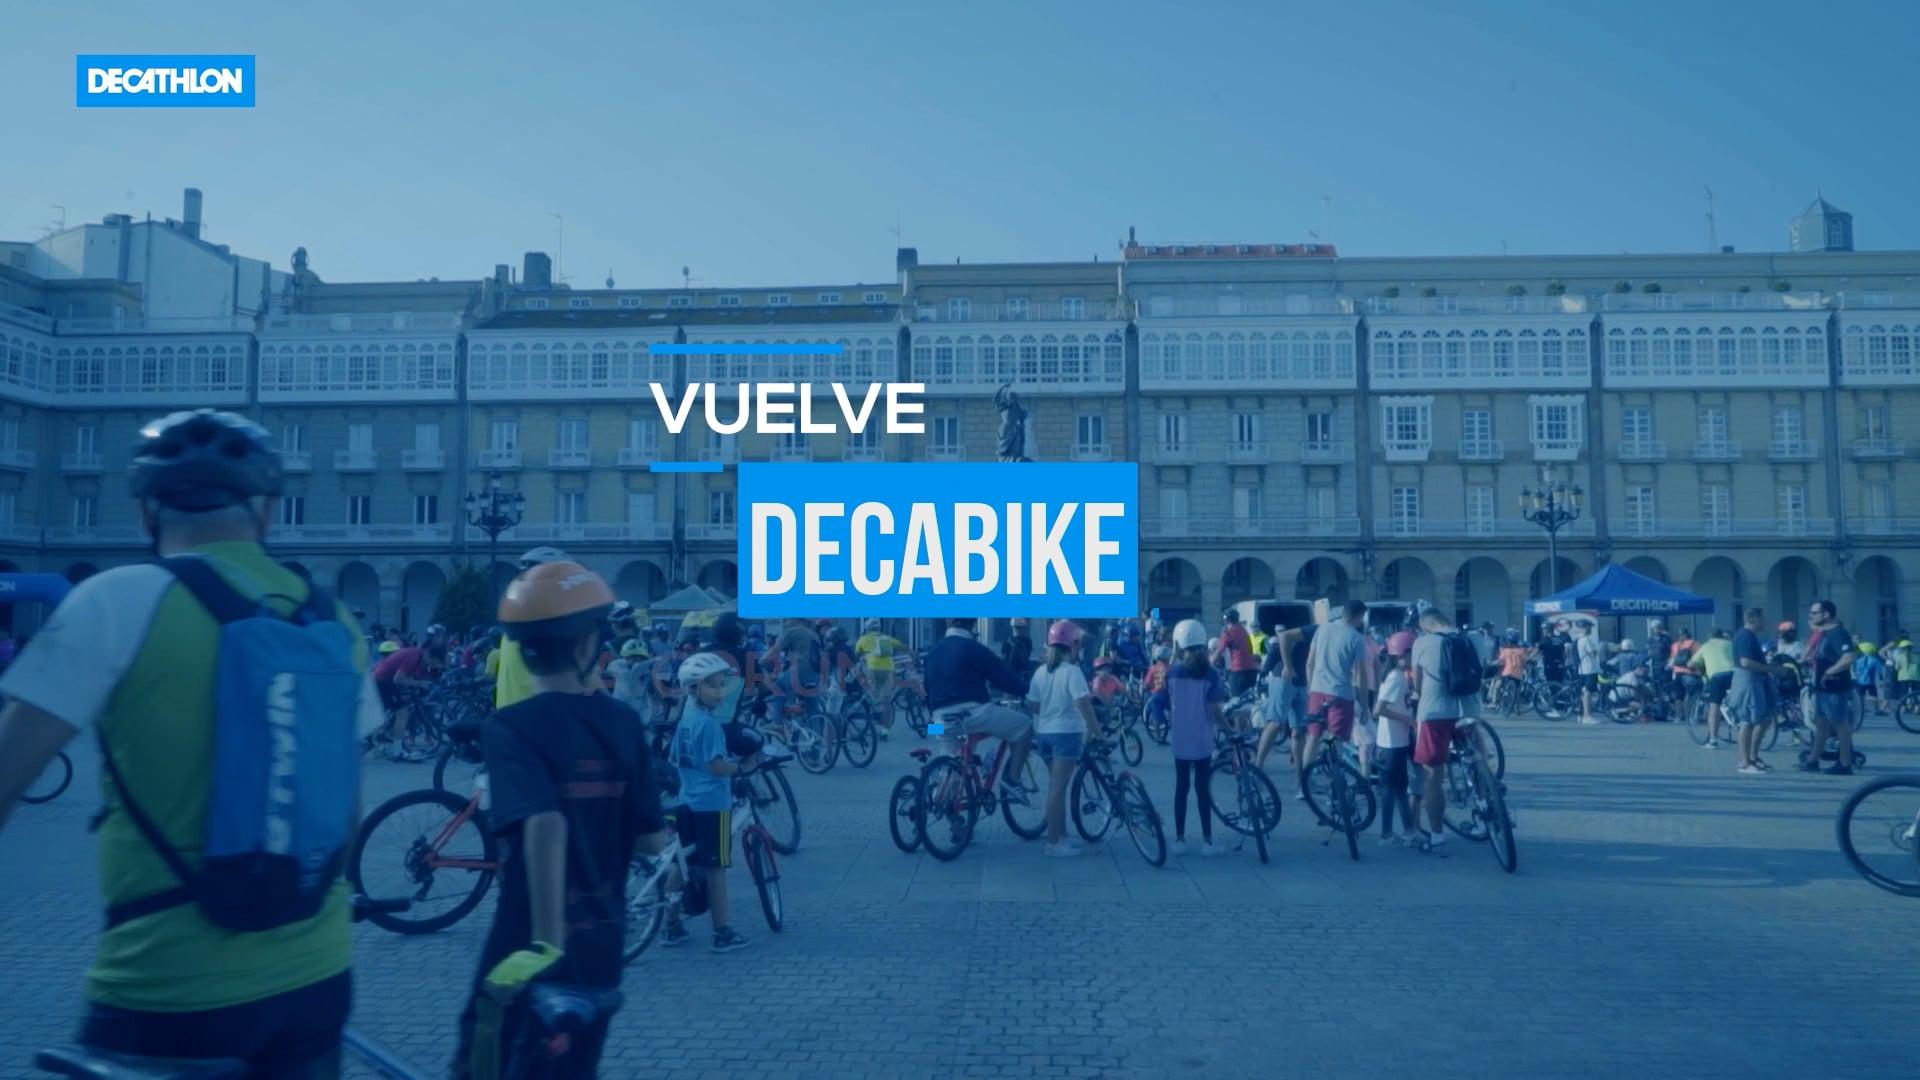 Decabike 2021 Coruña video promocional